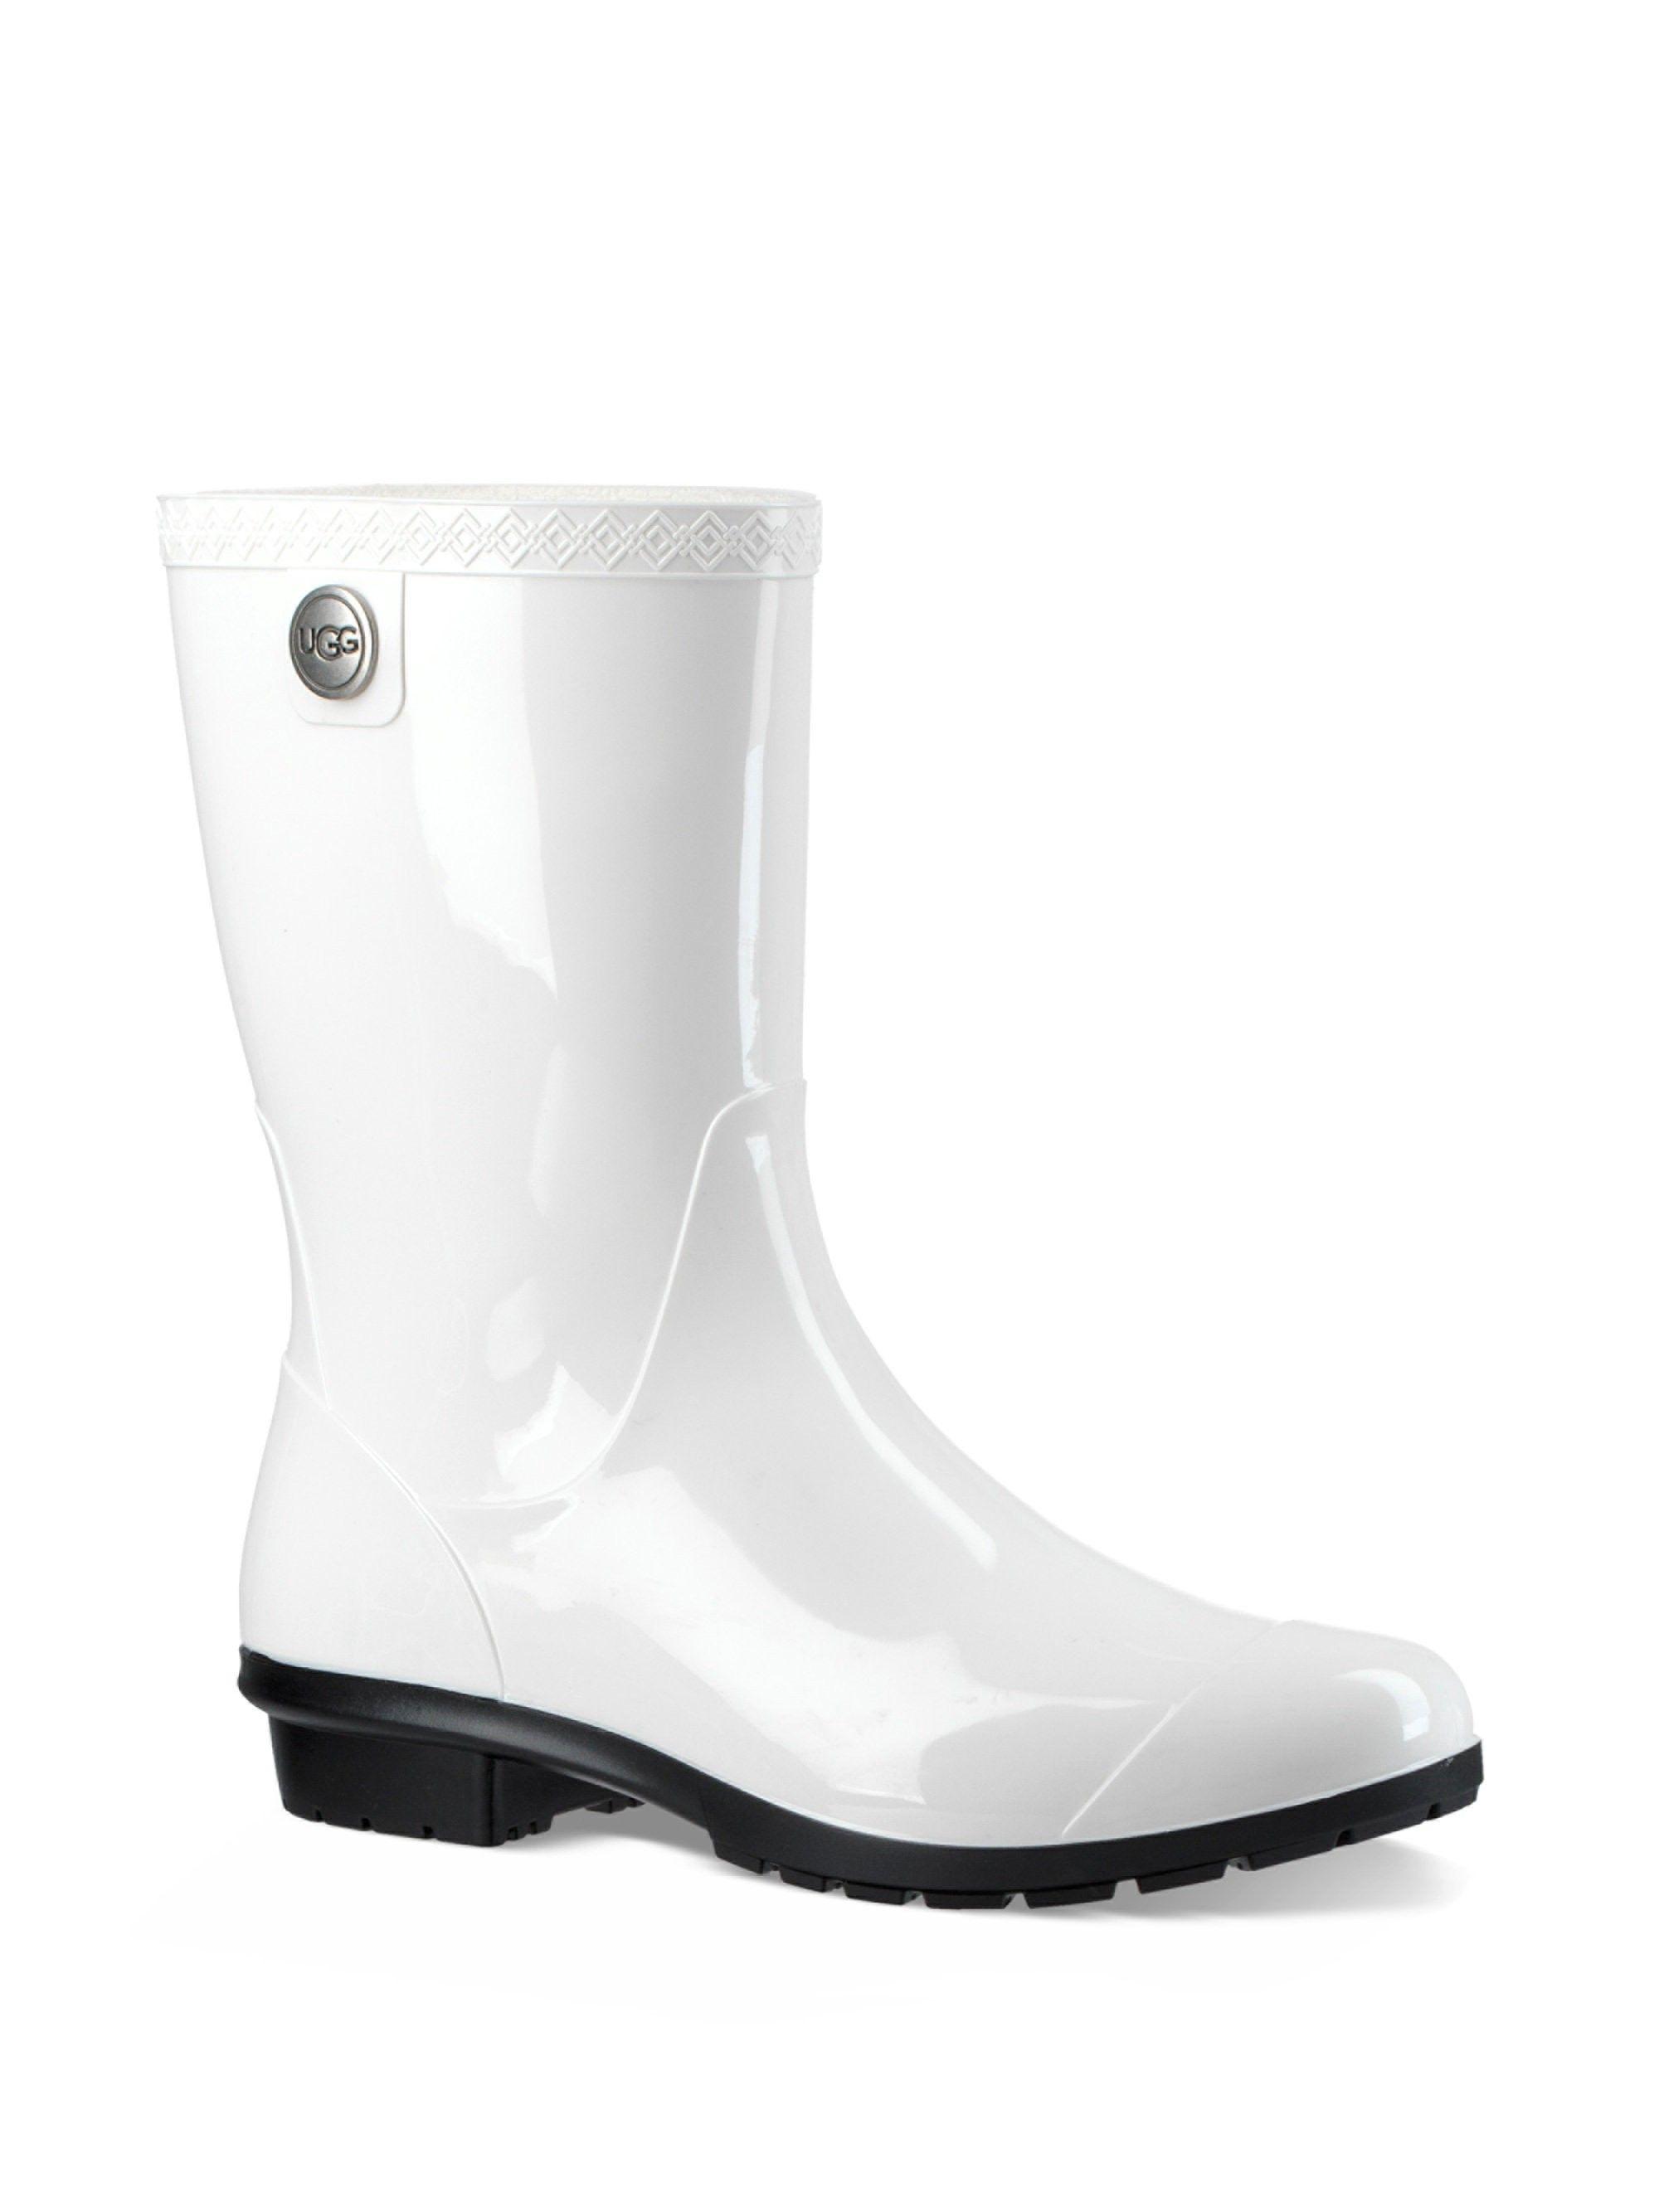 8d32c2b88b5 Ugg Australia Sienna Rain Boots - White 37 (7)   Products   Boots ...